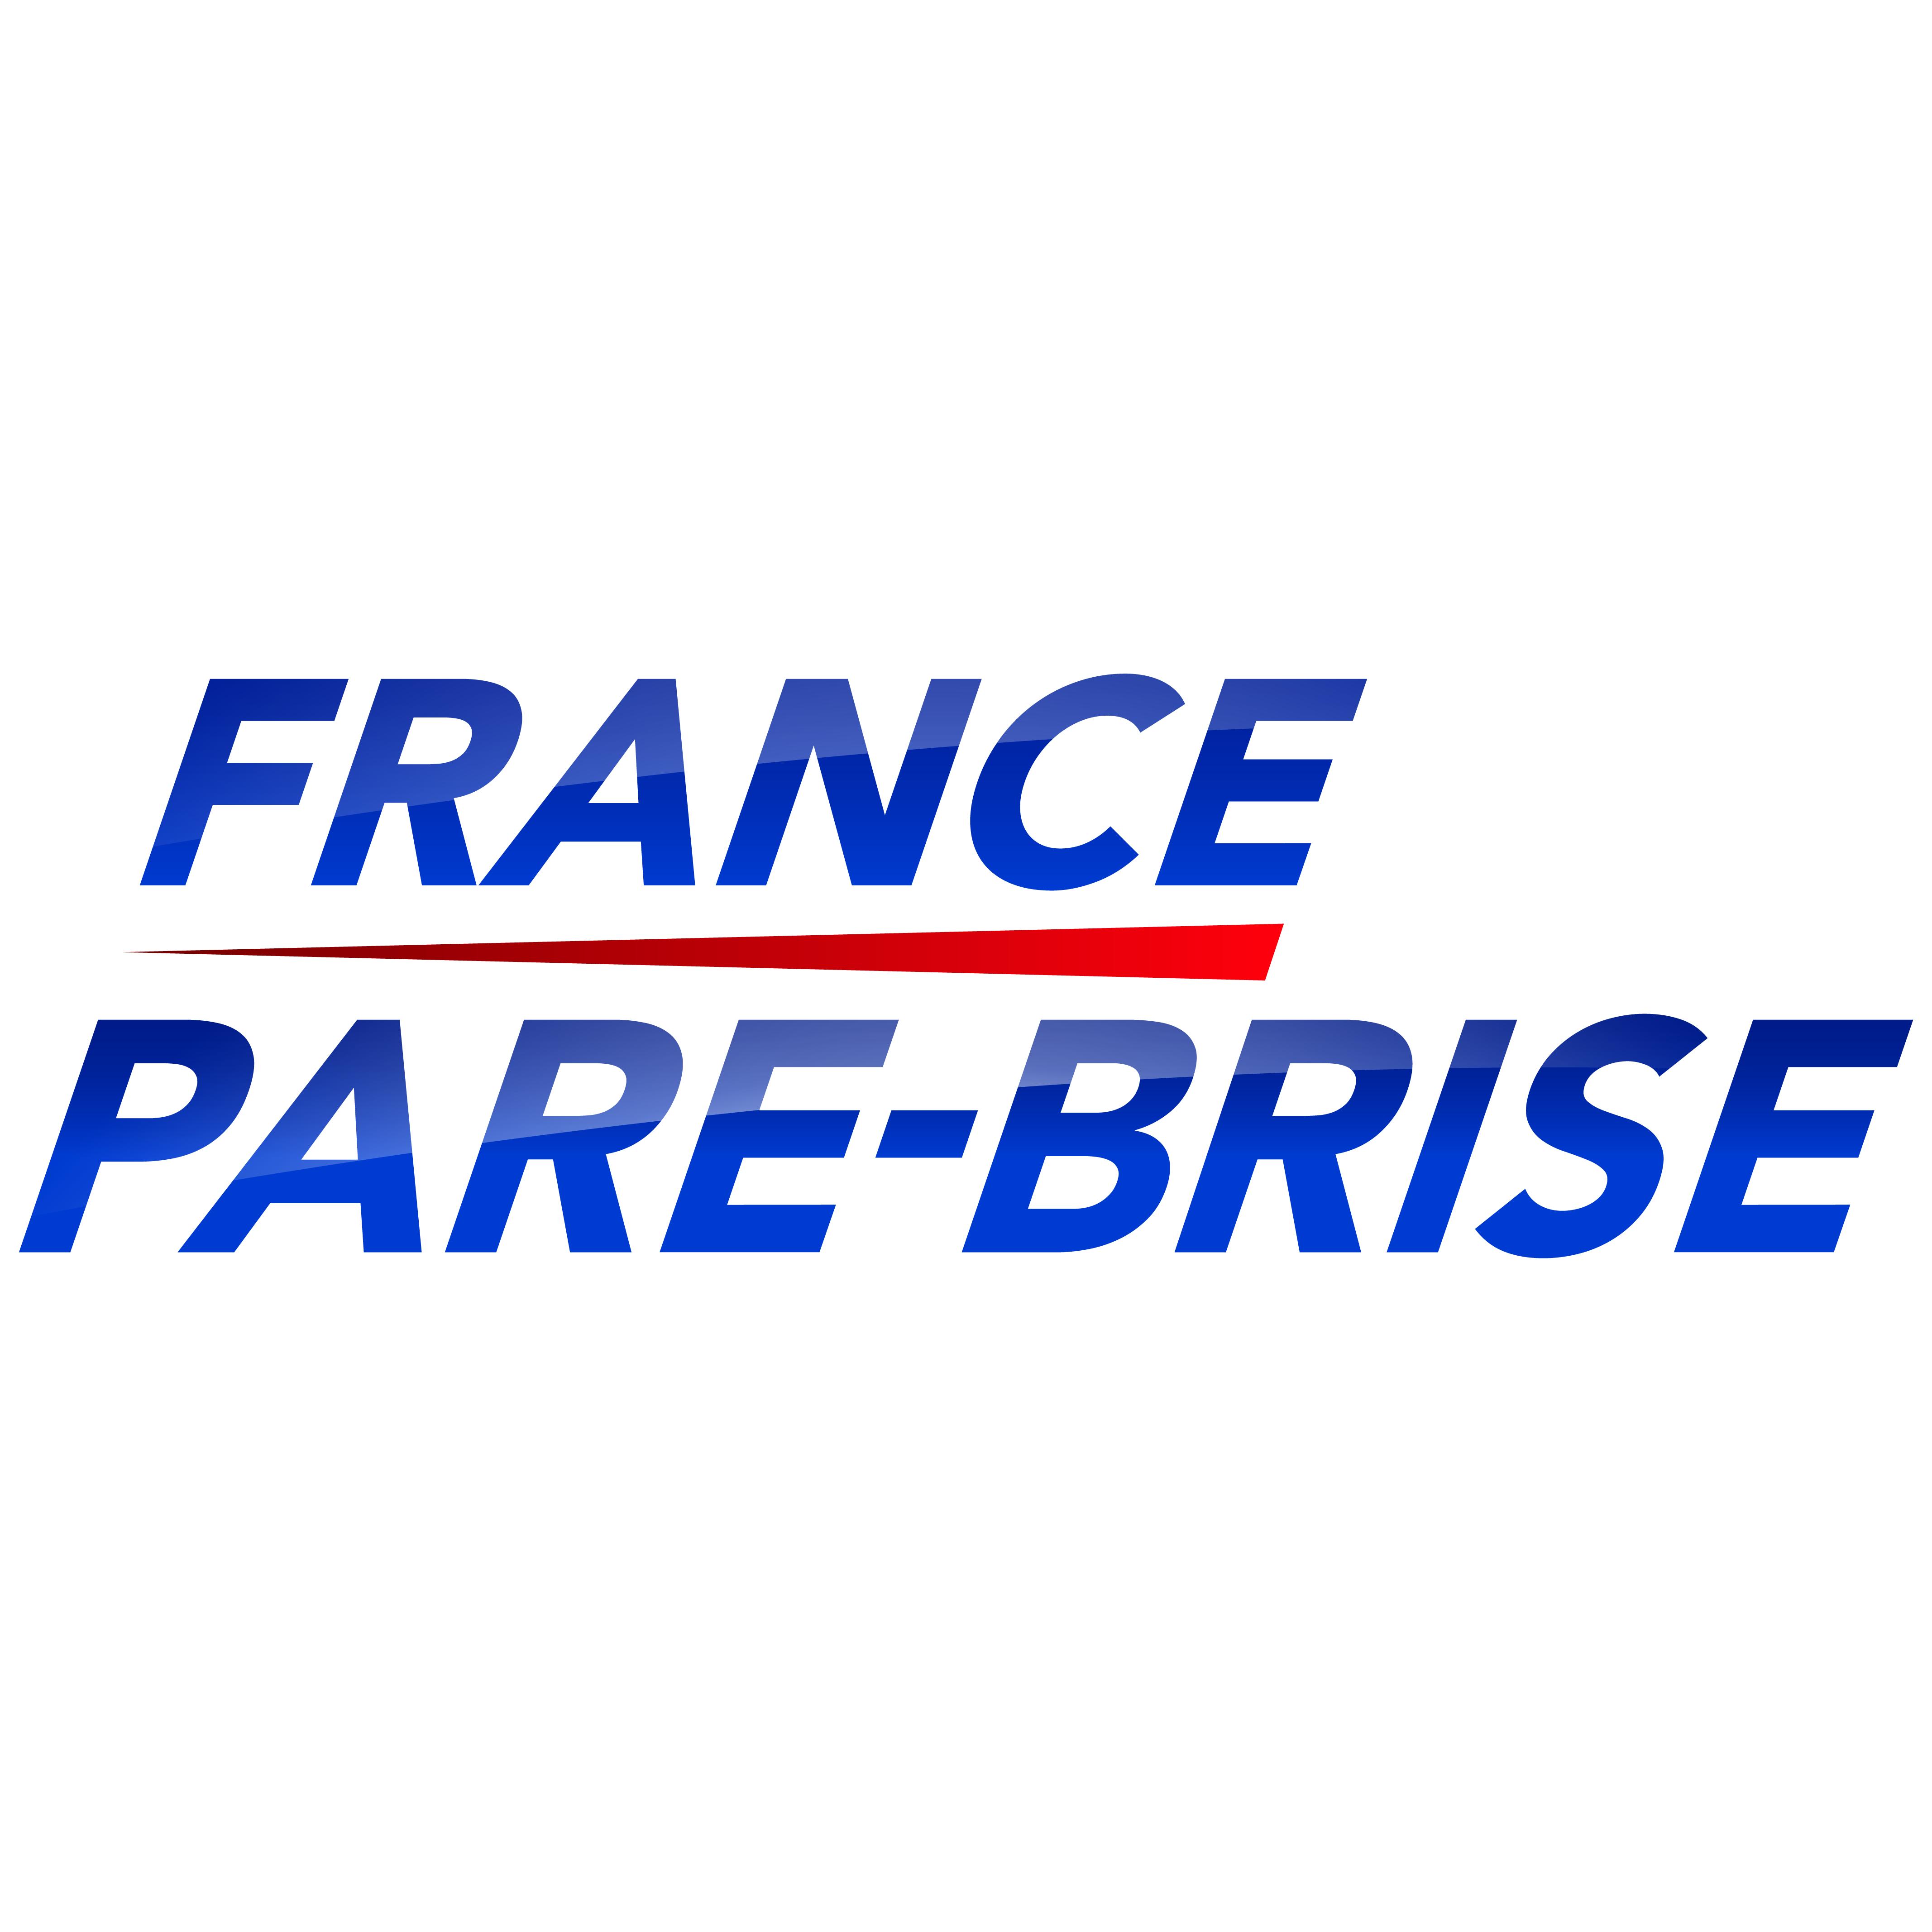 France Pare-Brise RENNES vitrerie (pose), vitrier